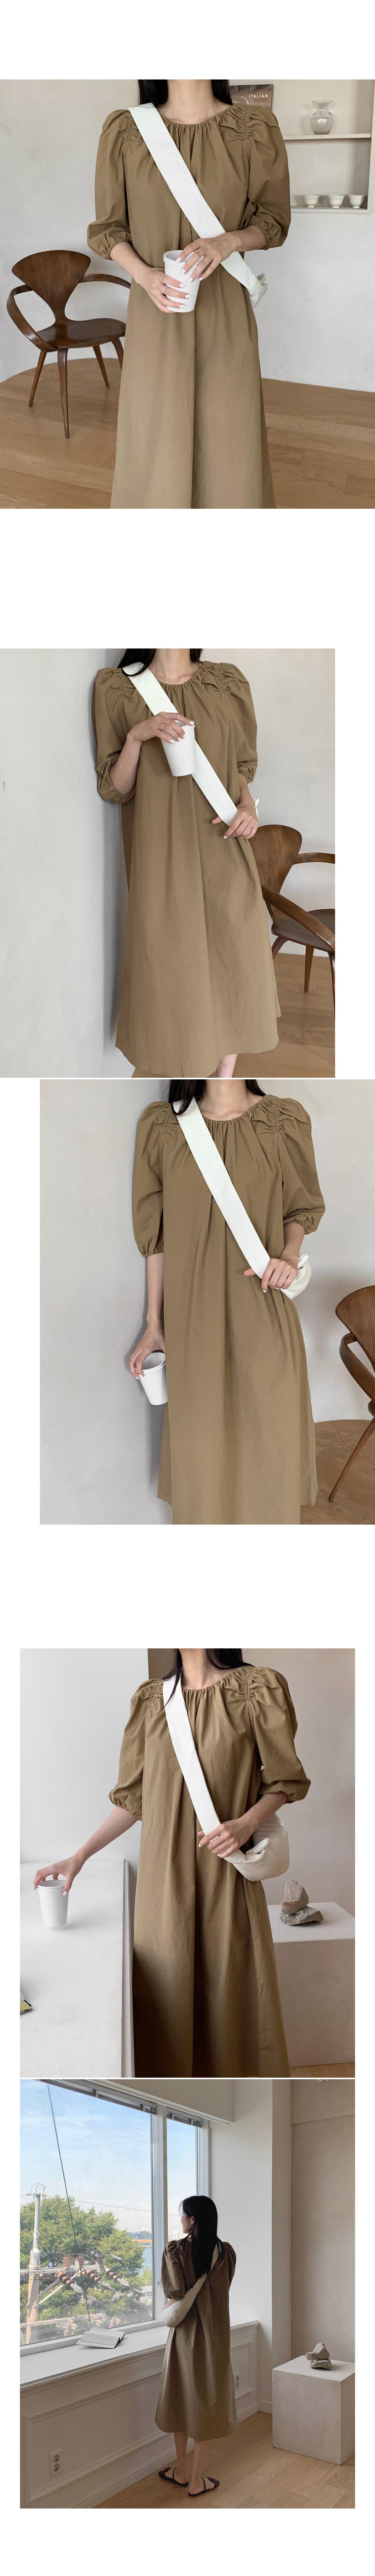 Buron Shirring Strap Long Dress - 2 color